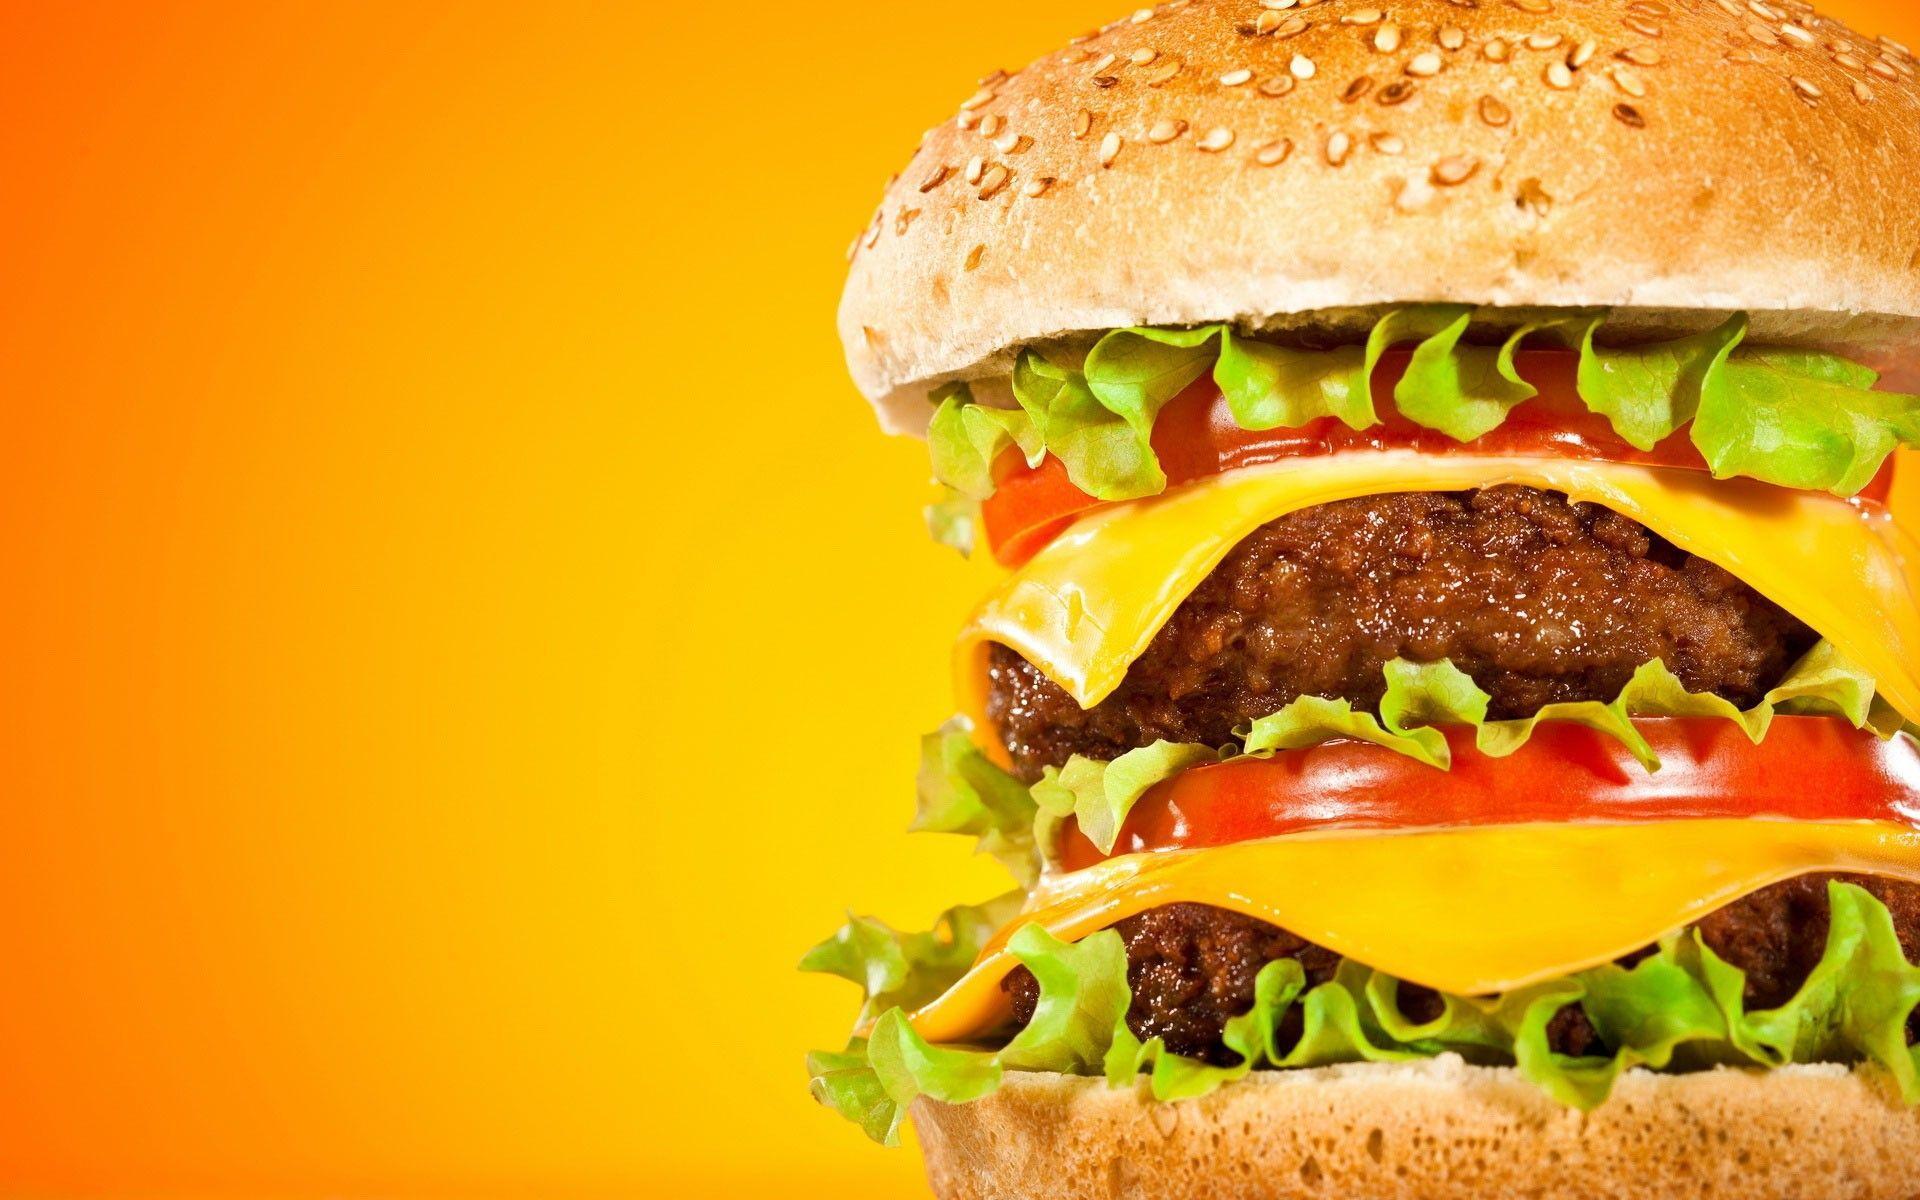 Big Mac Wallpapers - Top Free Big Mac Backgrounds ...